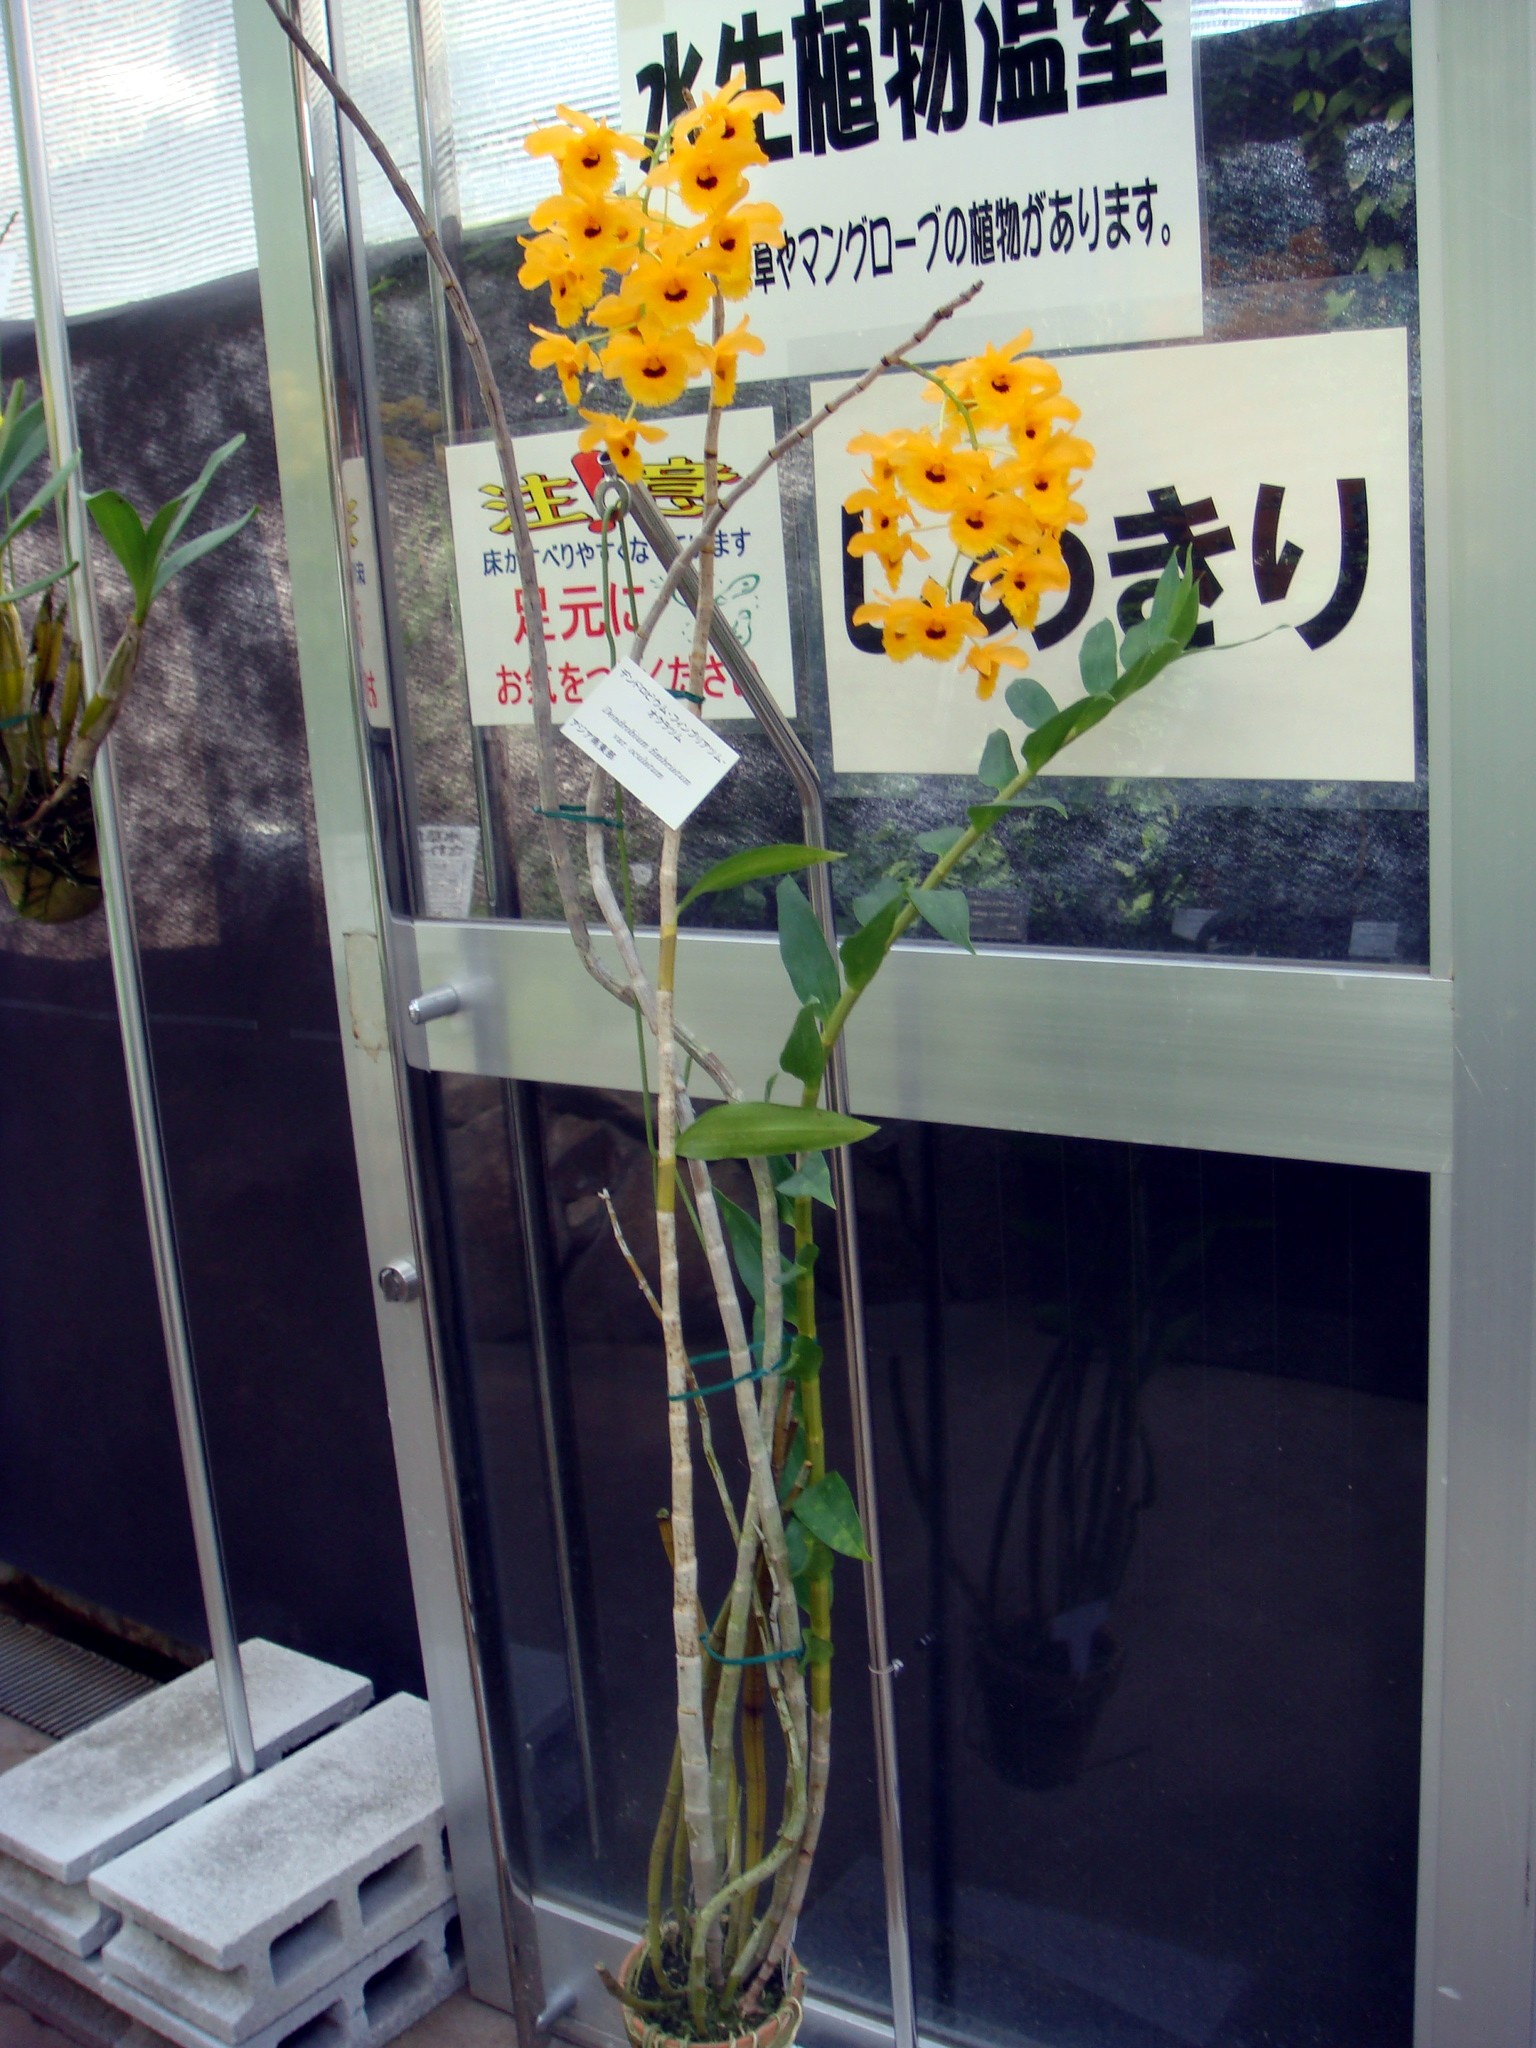 http://orchids.la.coocan.jp/Dendrobium/Dendrobium%20fimbriatum%20oculatum/DSC04995.JPG